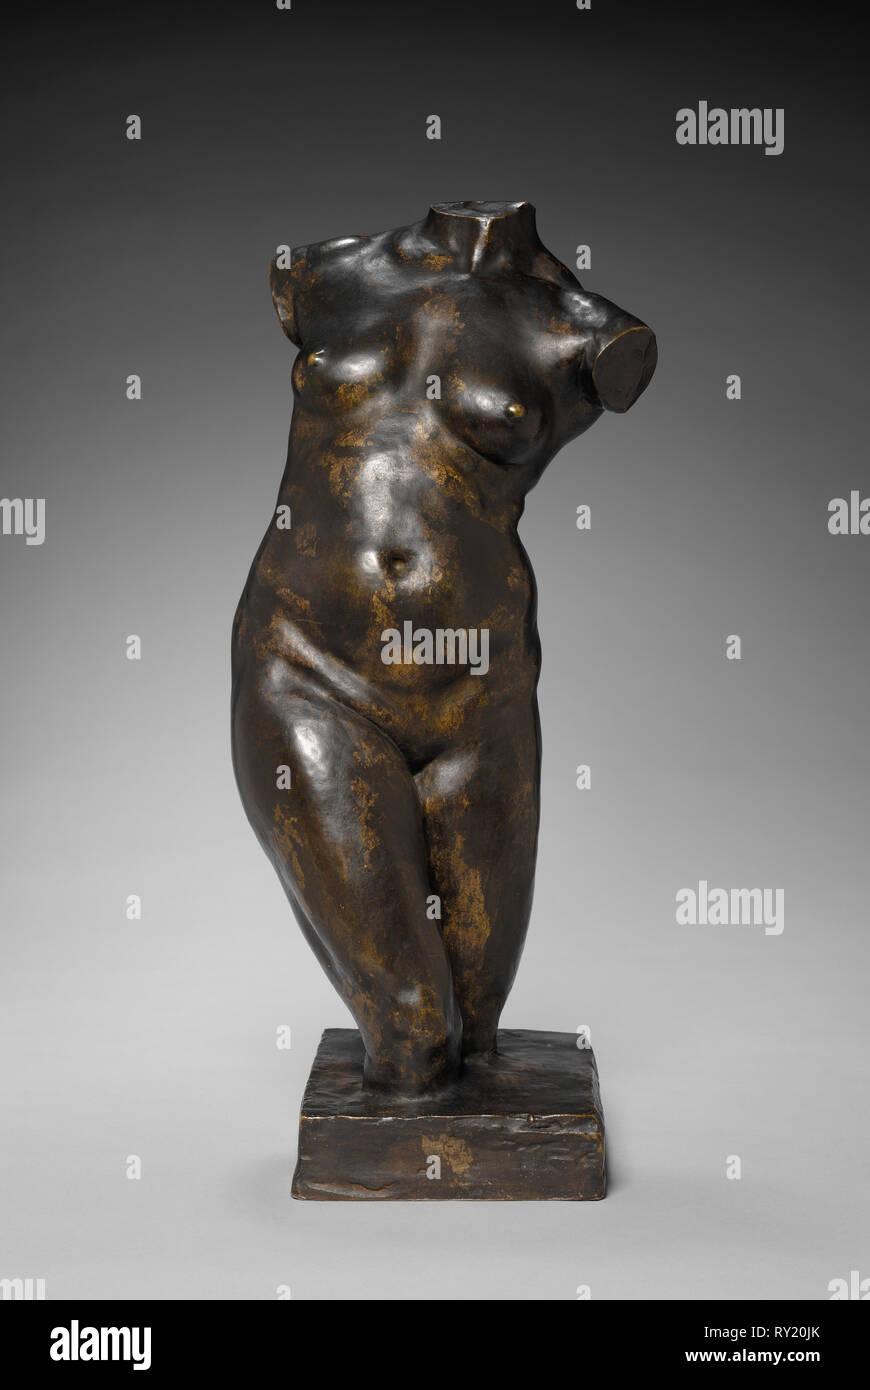 Torso, c. 1850 - 1899. Jules Dalou (French, 1838-1902). Bronze; overall: 49.6 cm (19 1/2 in - Stock Image